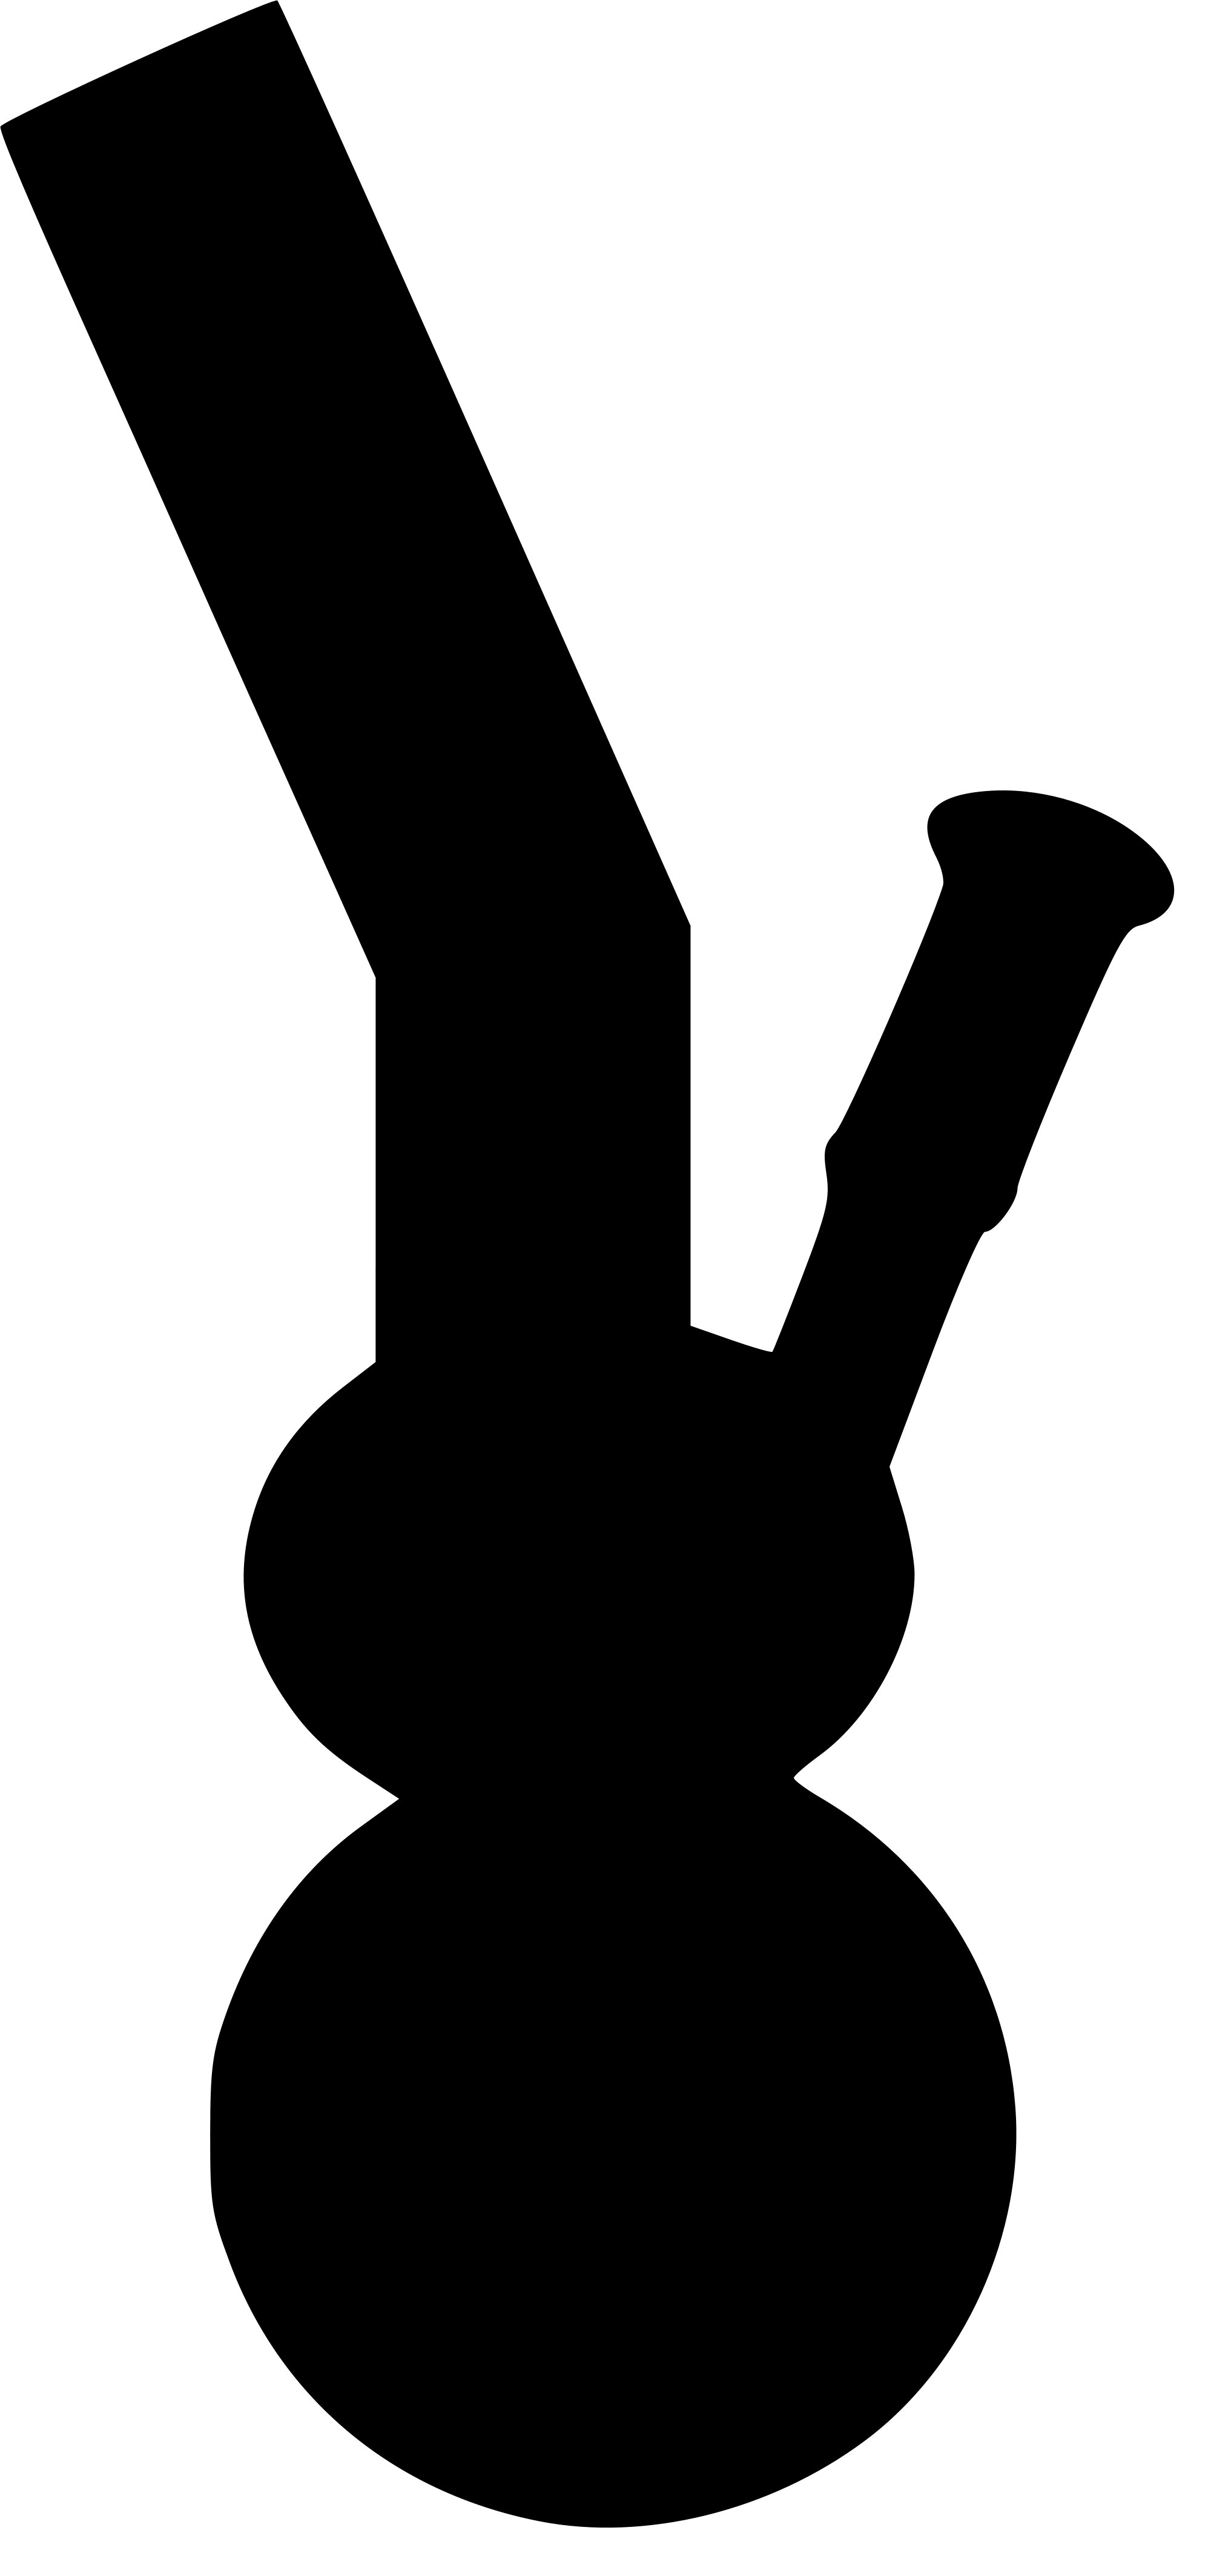 freeuse download Bong vector. File bongsilhouette svg wikimedia